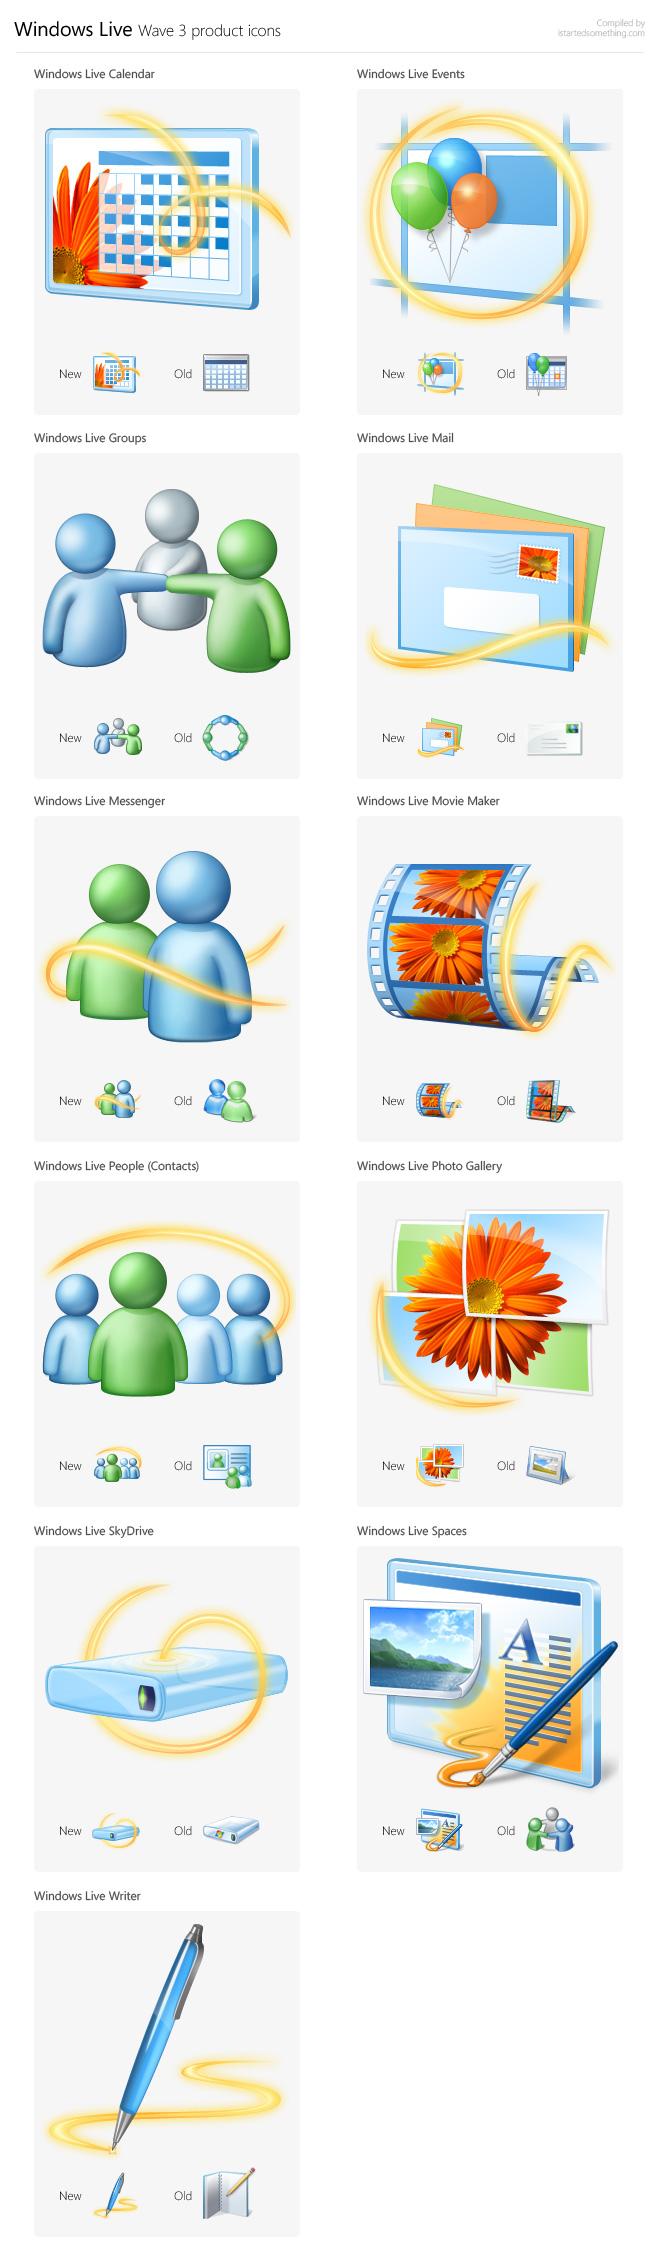 nyewindowsliveikon Windows Live får nye ikon